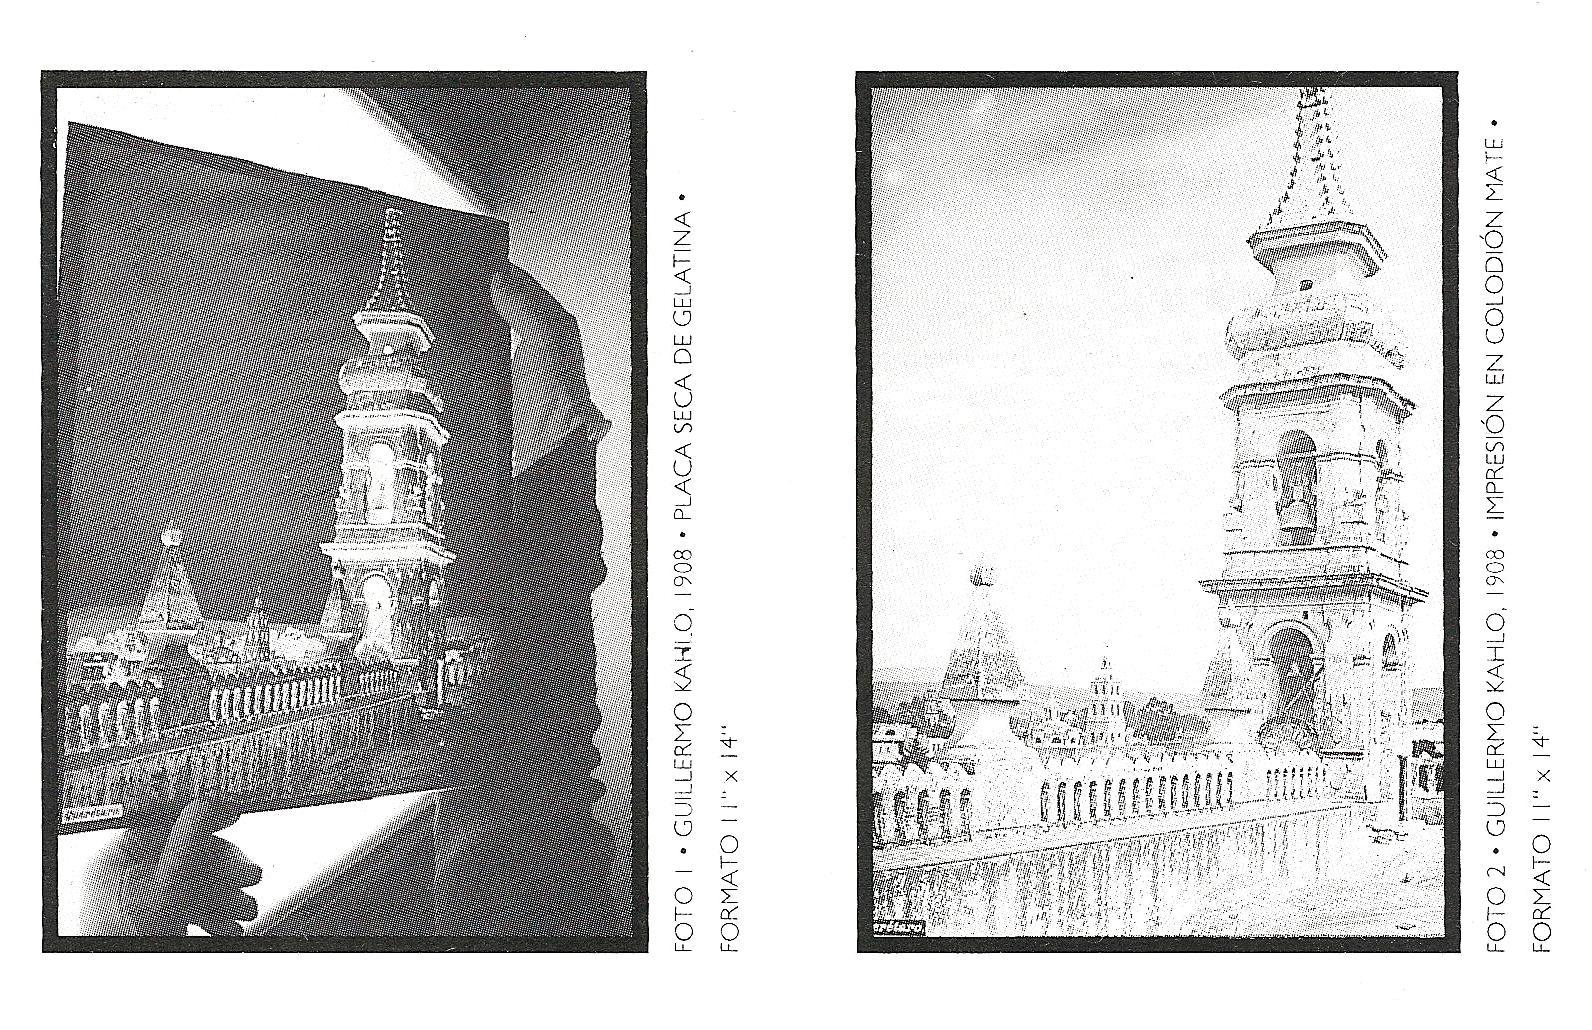 Foto 1 y 2